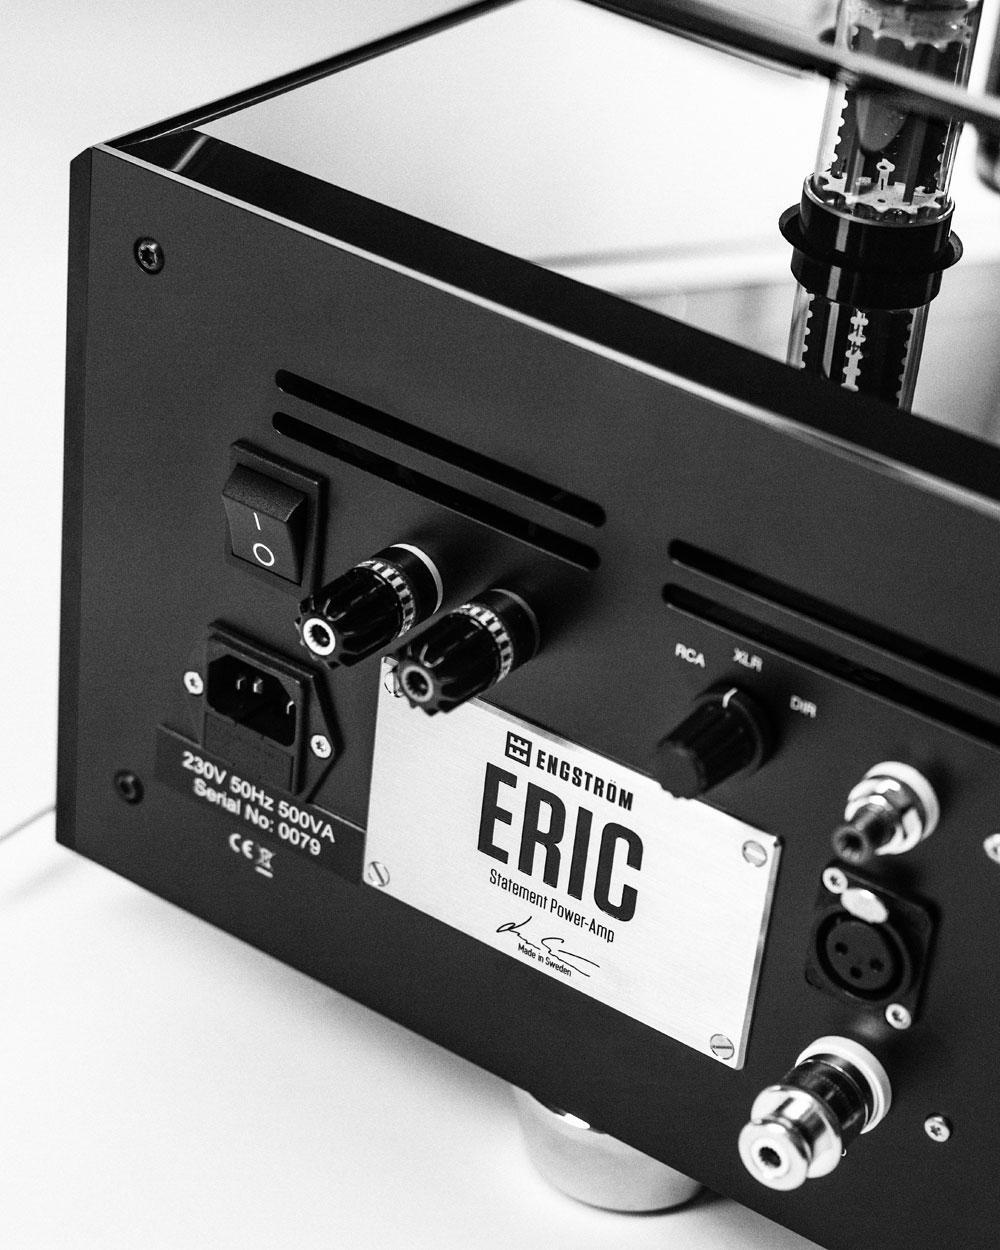 Eric-Details-4.jpg